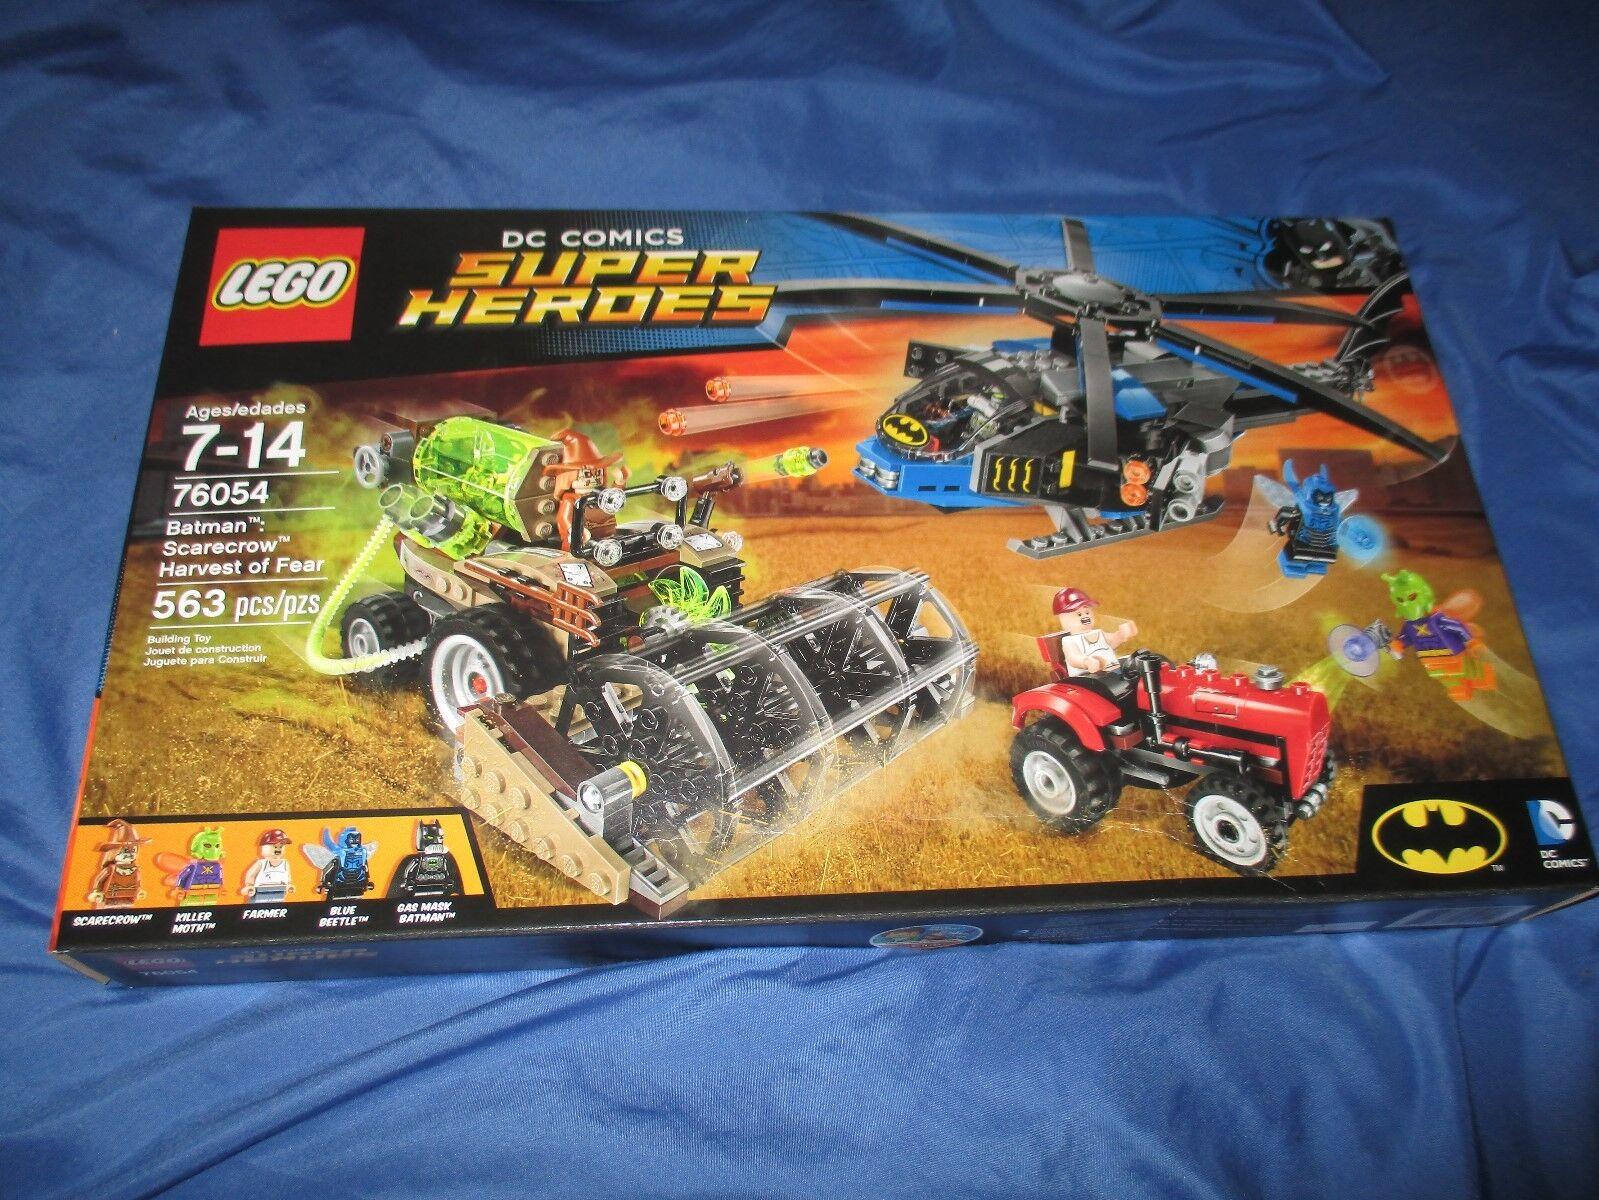 LEGO DC COMICS SUPER HEROES Batman Scarecrow Harvest of Fear w Minifigure